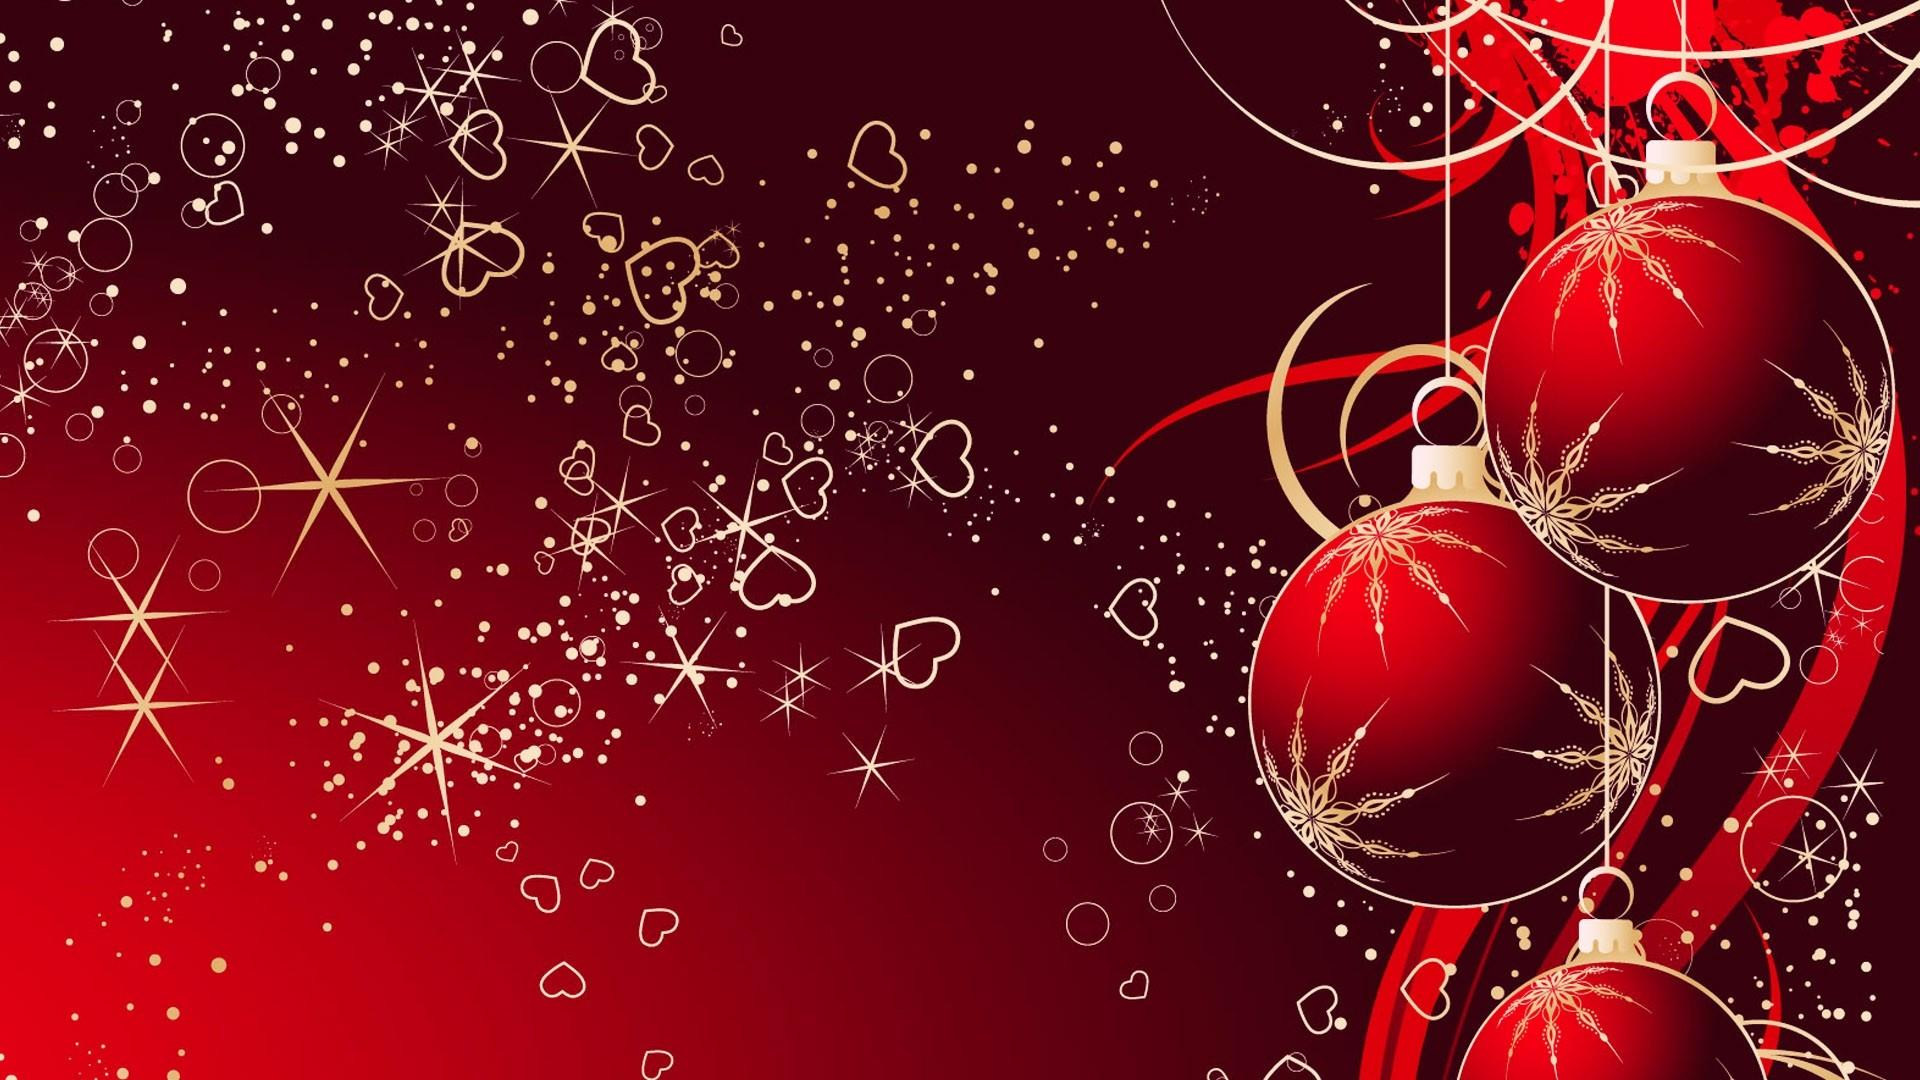 Christmas. Winter And Merry Christmas Wallpaper HD